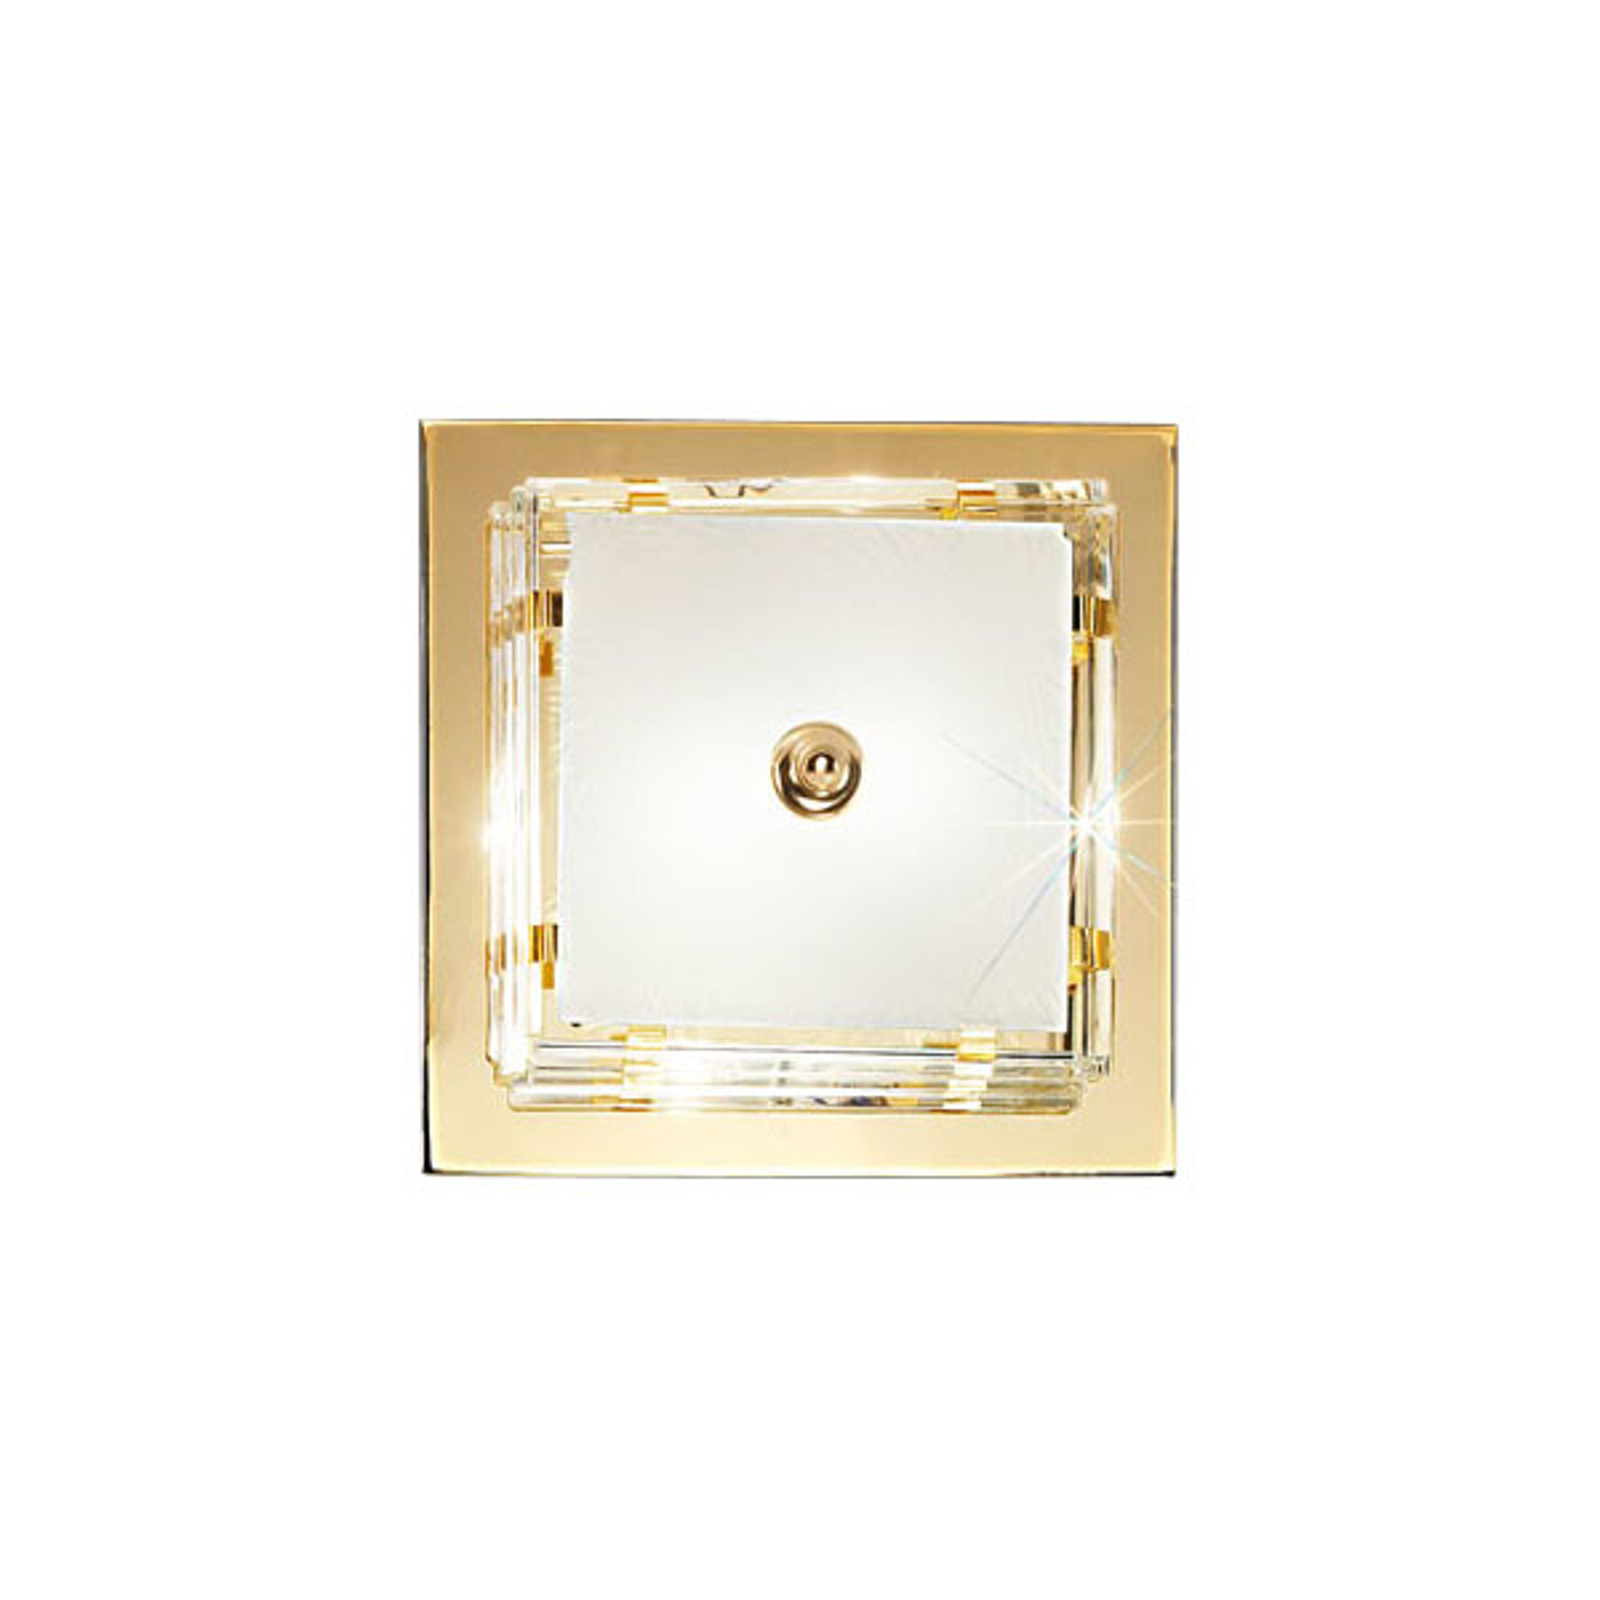 Plafondlamp Ontario, 39 x 39 cm, goud